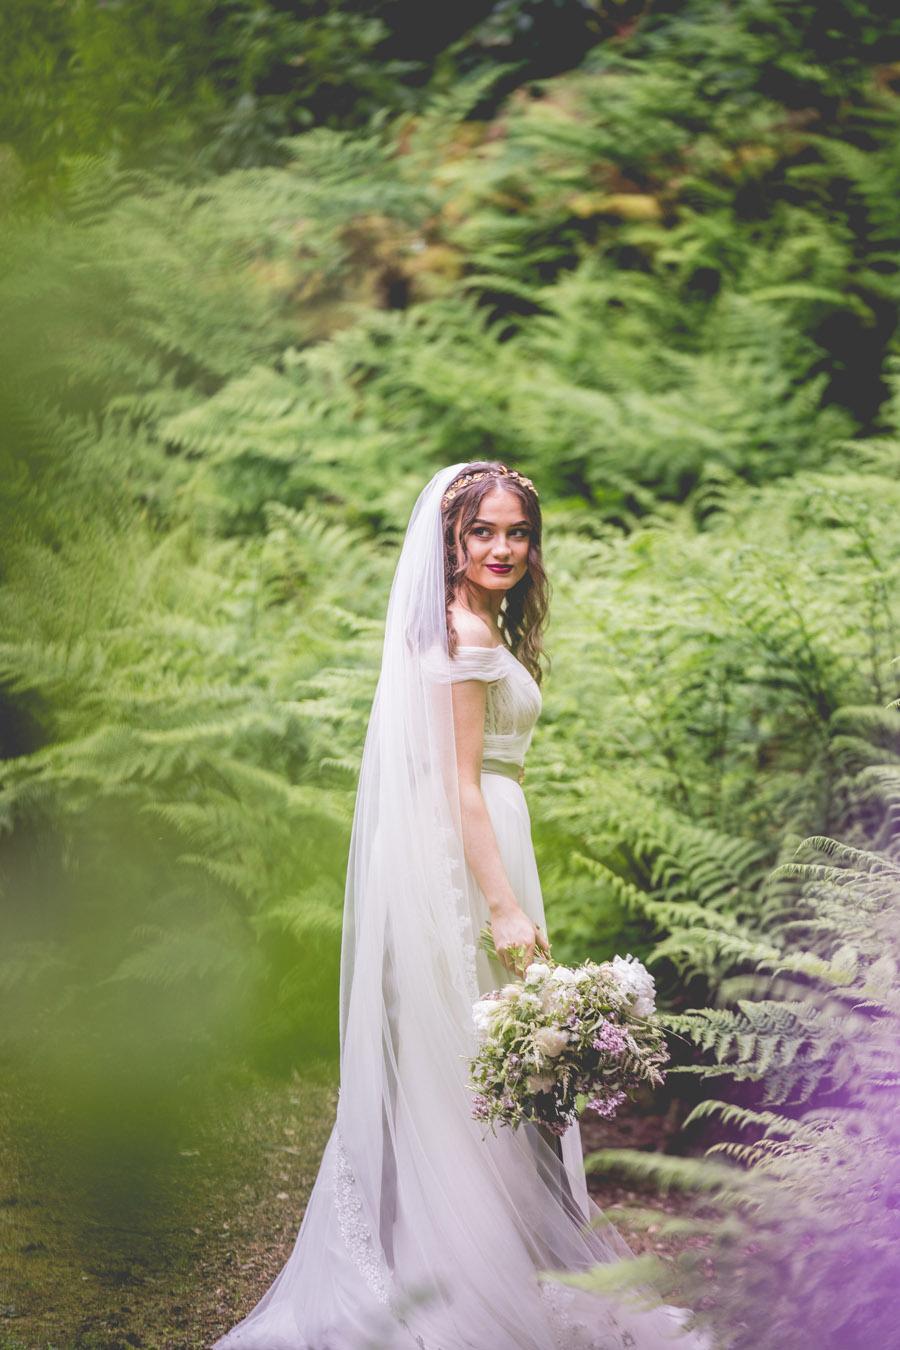 Eshott Hall wedding inspiration, credit Sean Elliott Photography (24)